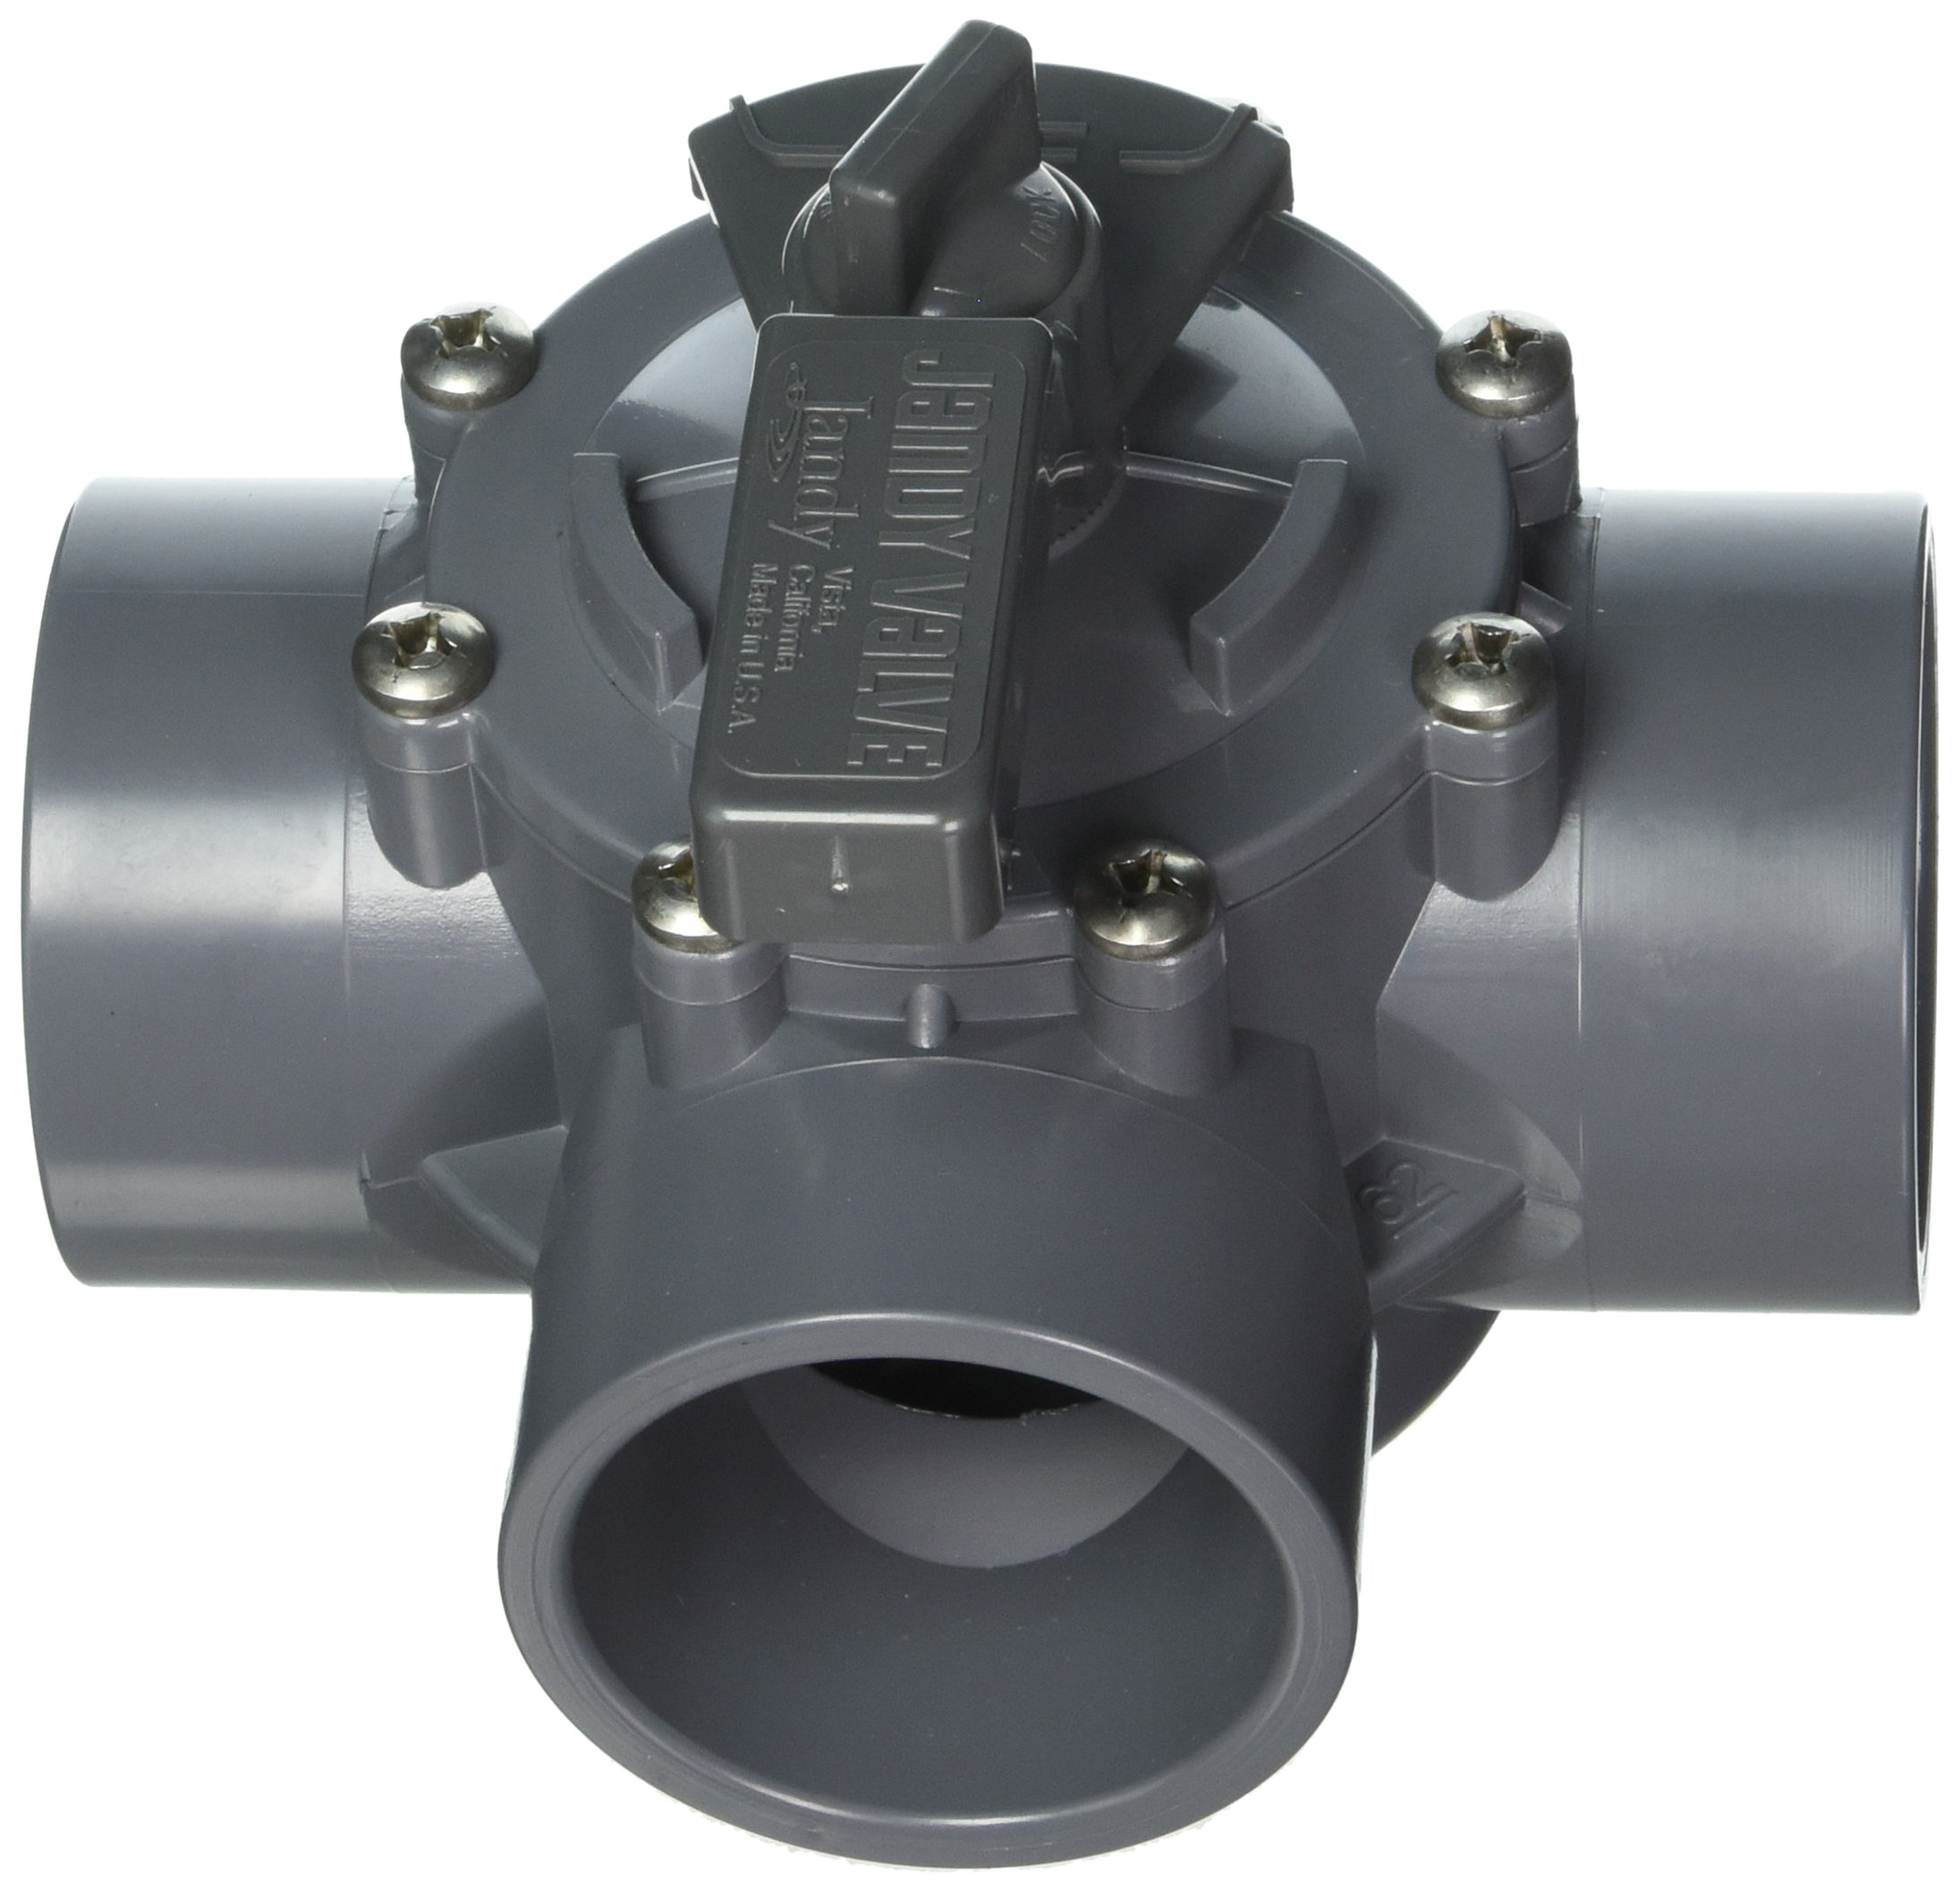 Jandy 2875 3-Port 2 to 2-1/2-Inch Positive Seal Pump Valve, Gray by Jandy